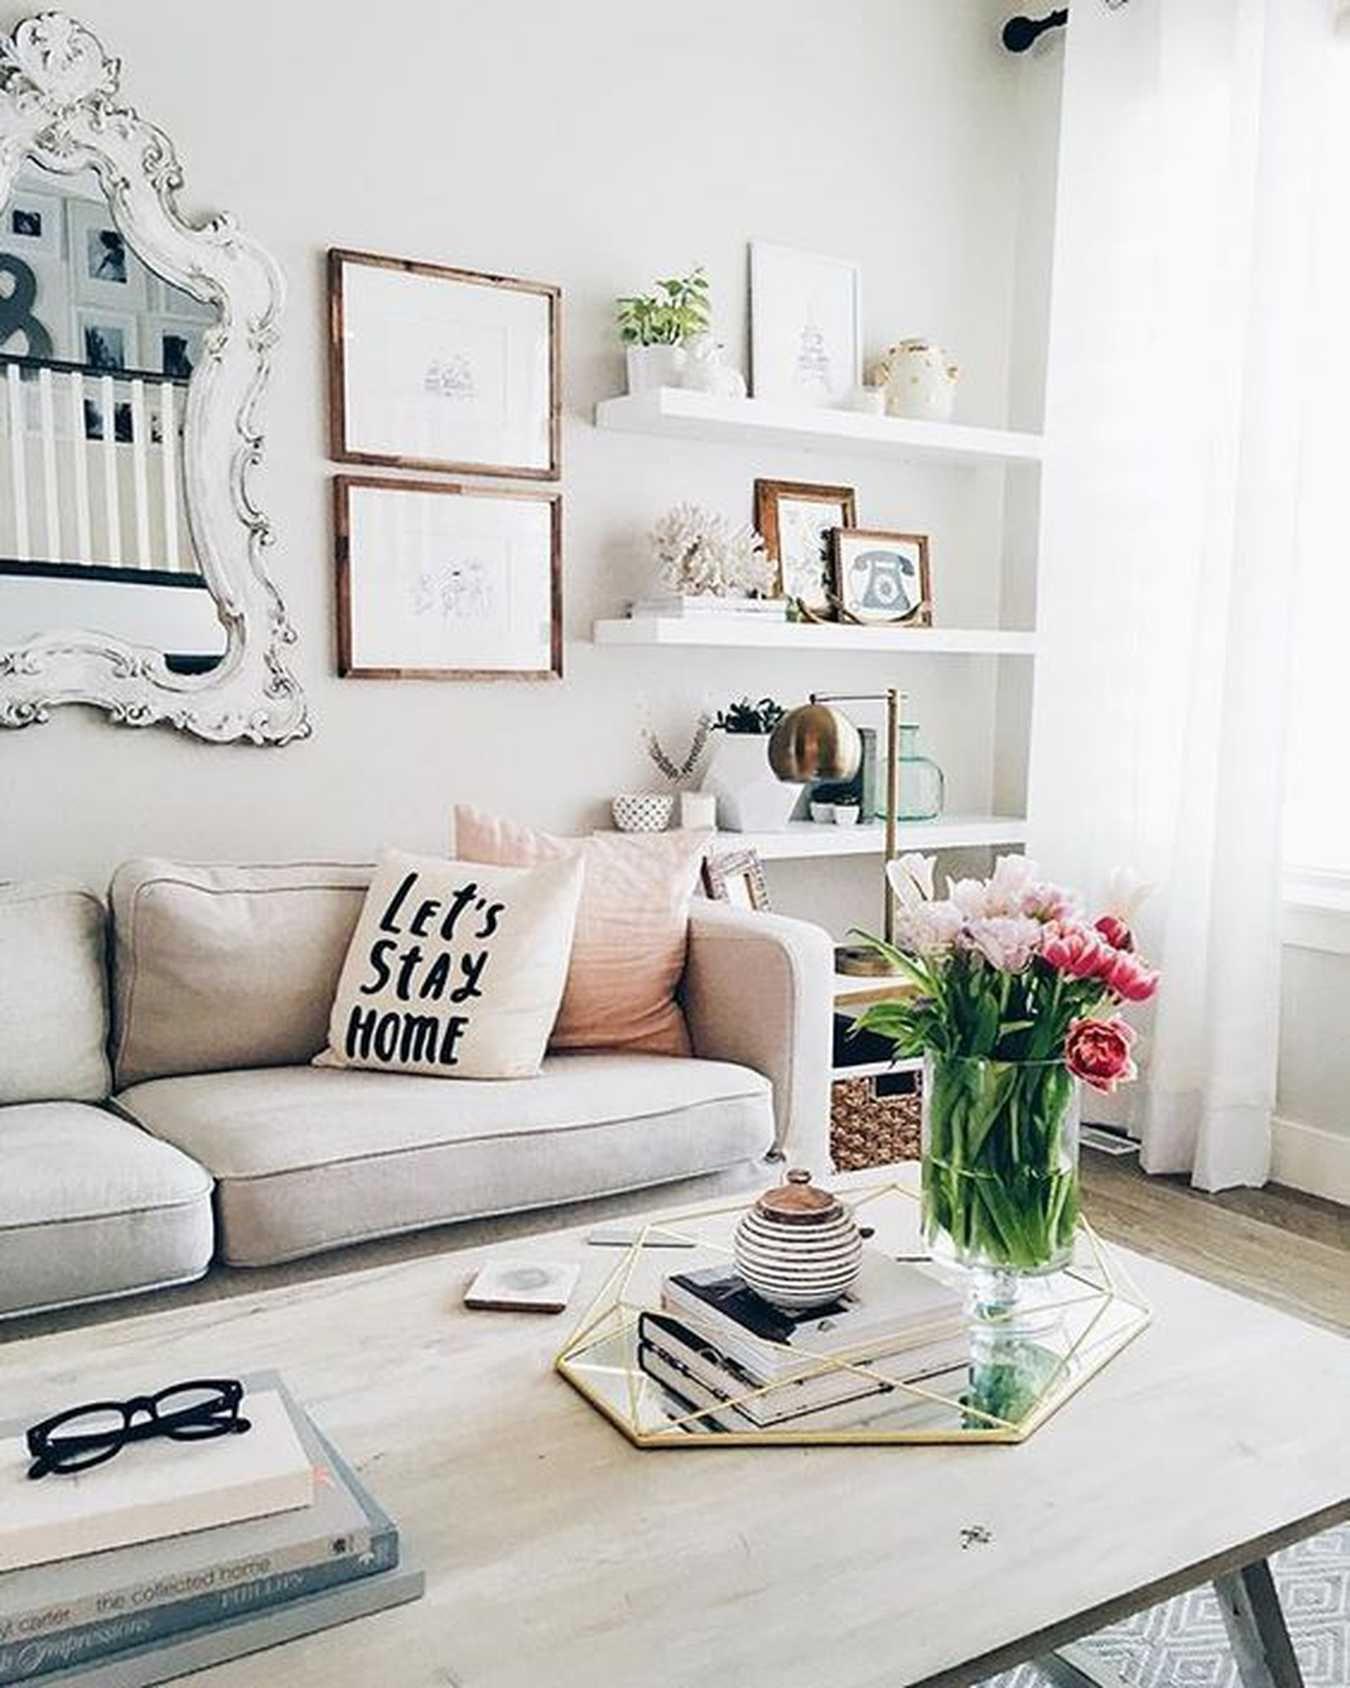 Interior Design Style Quiz   Decorating Style Quiz   Havenly   Home Decor, Room Inspiration, Apartment Living Room